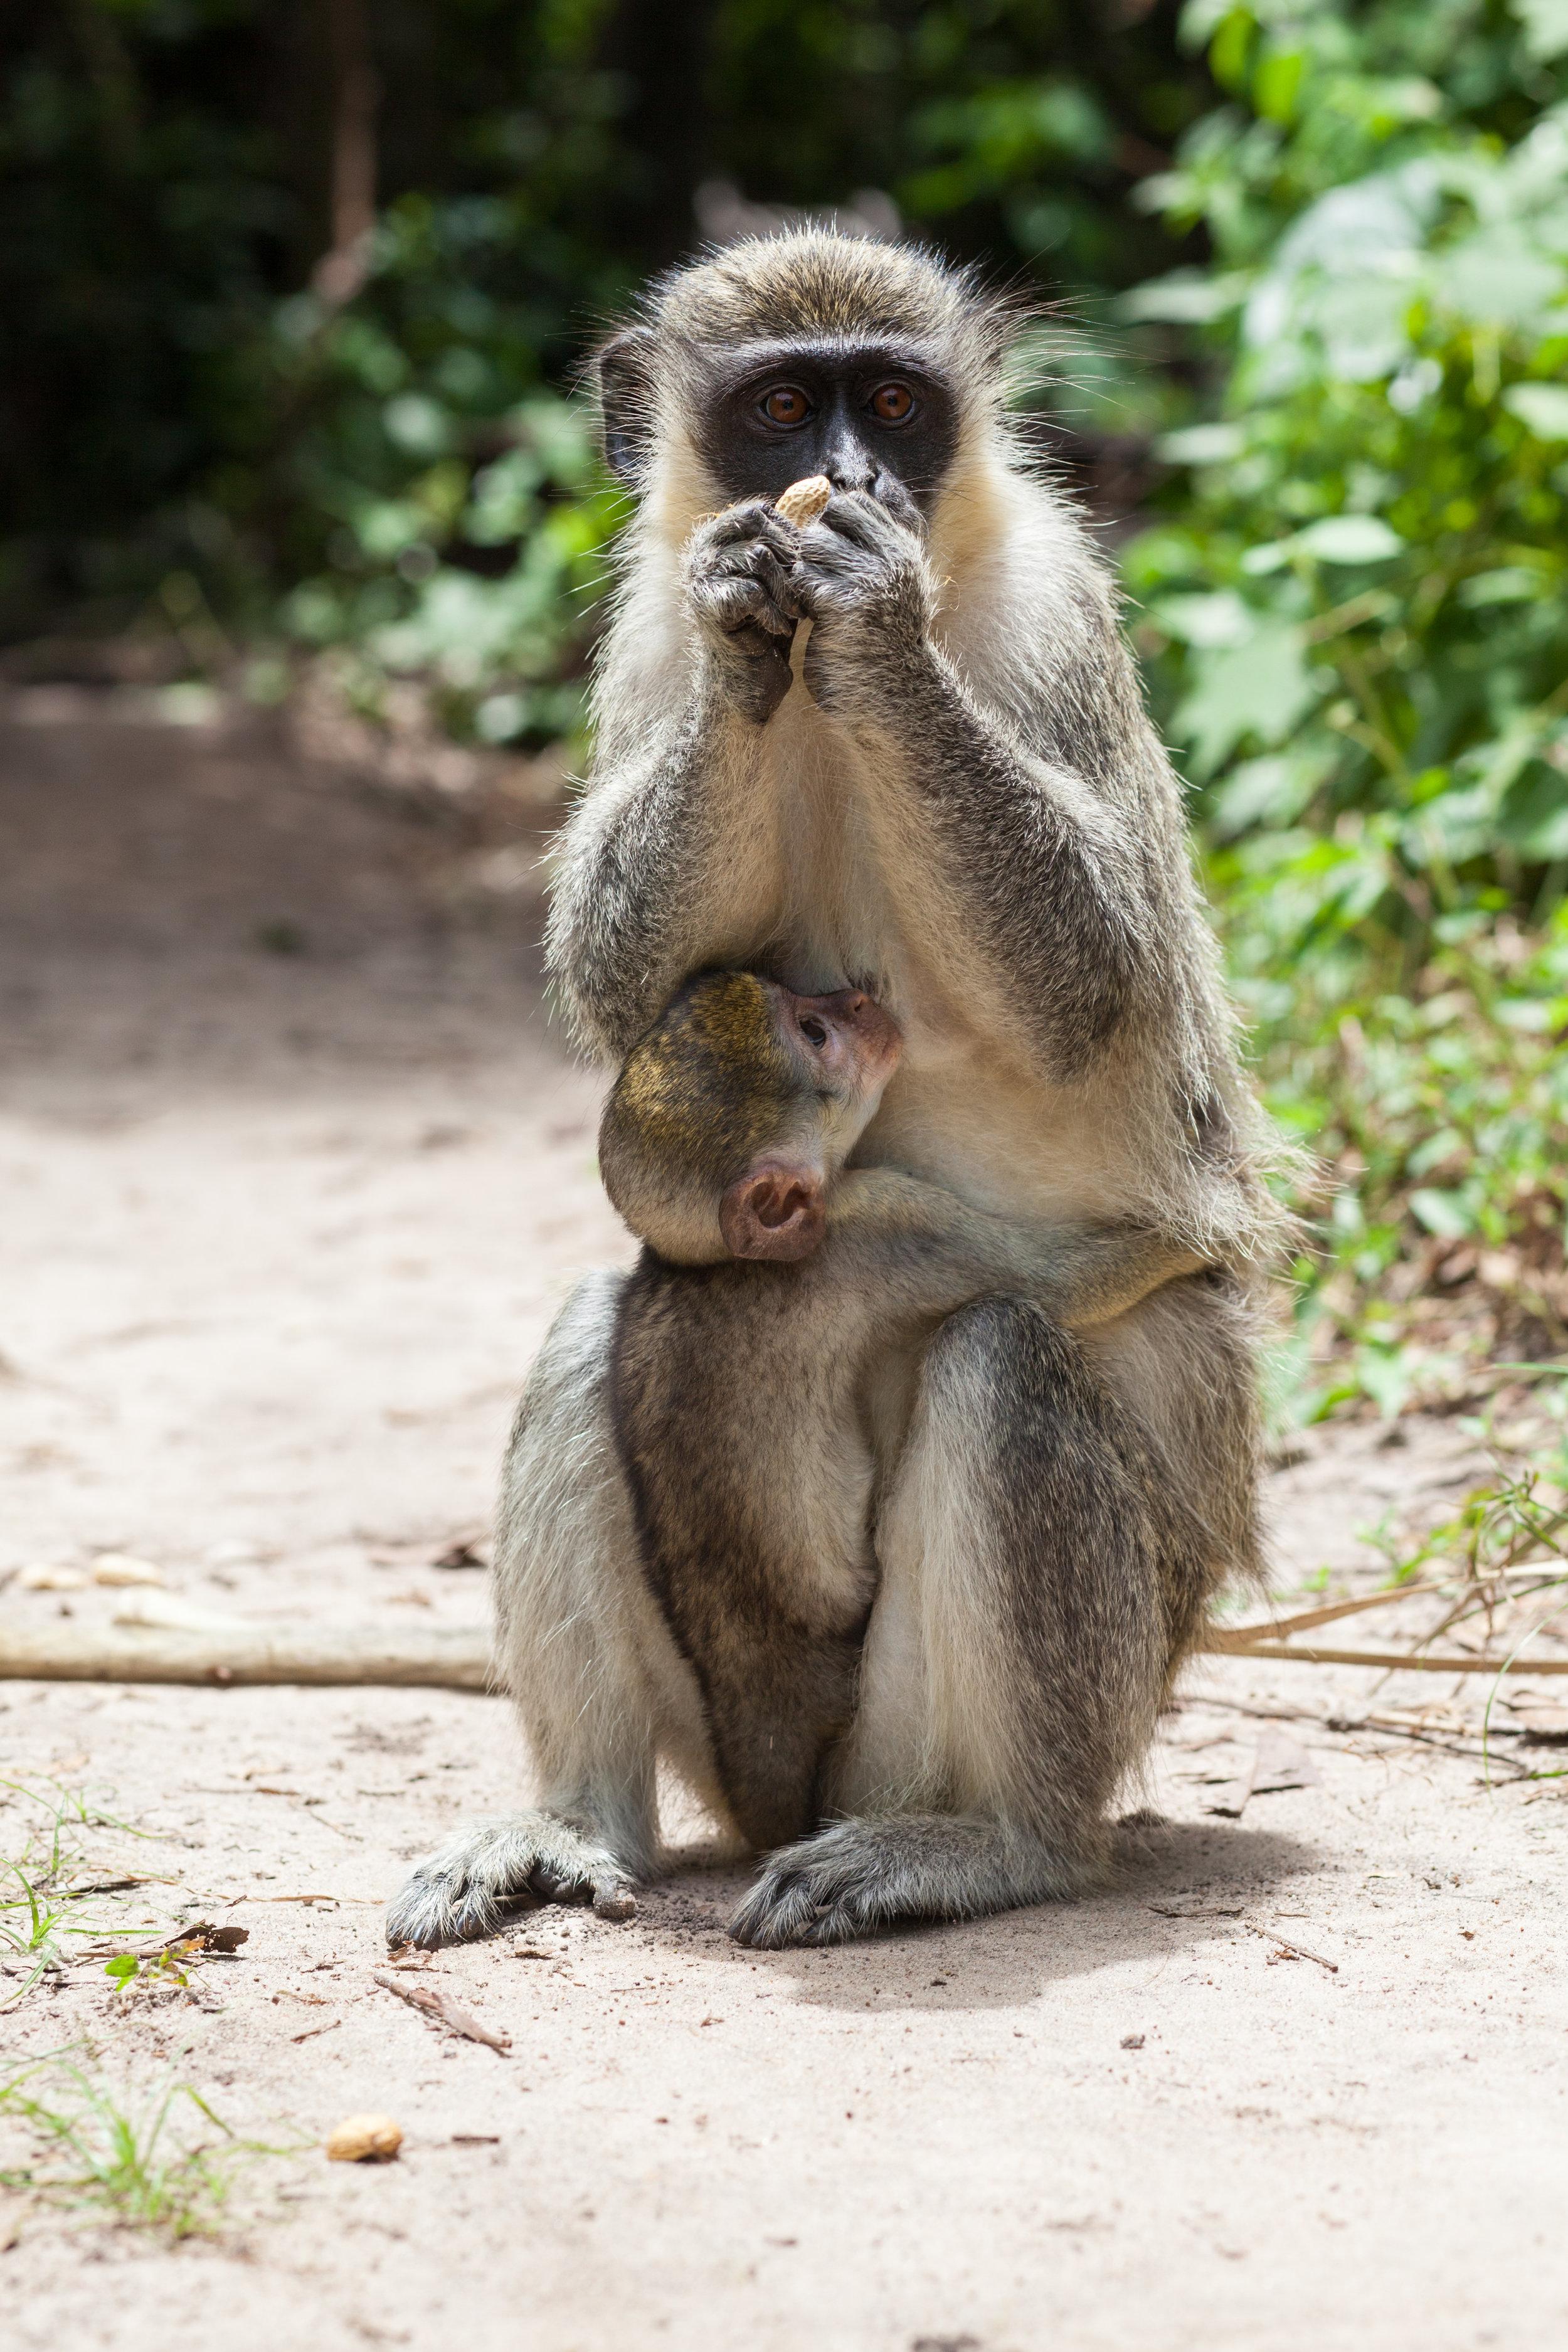 Monkey_Forest_18.jpg